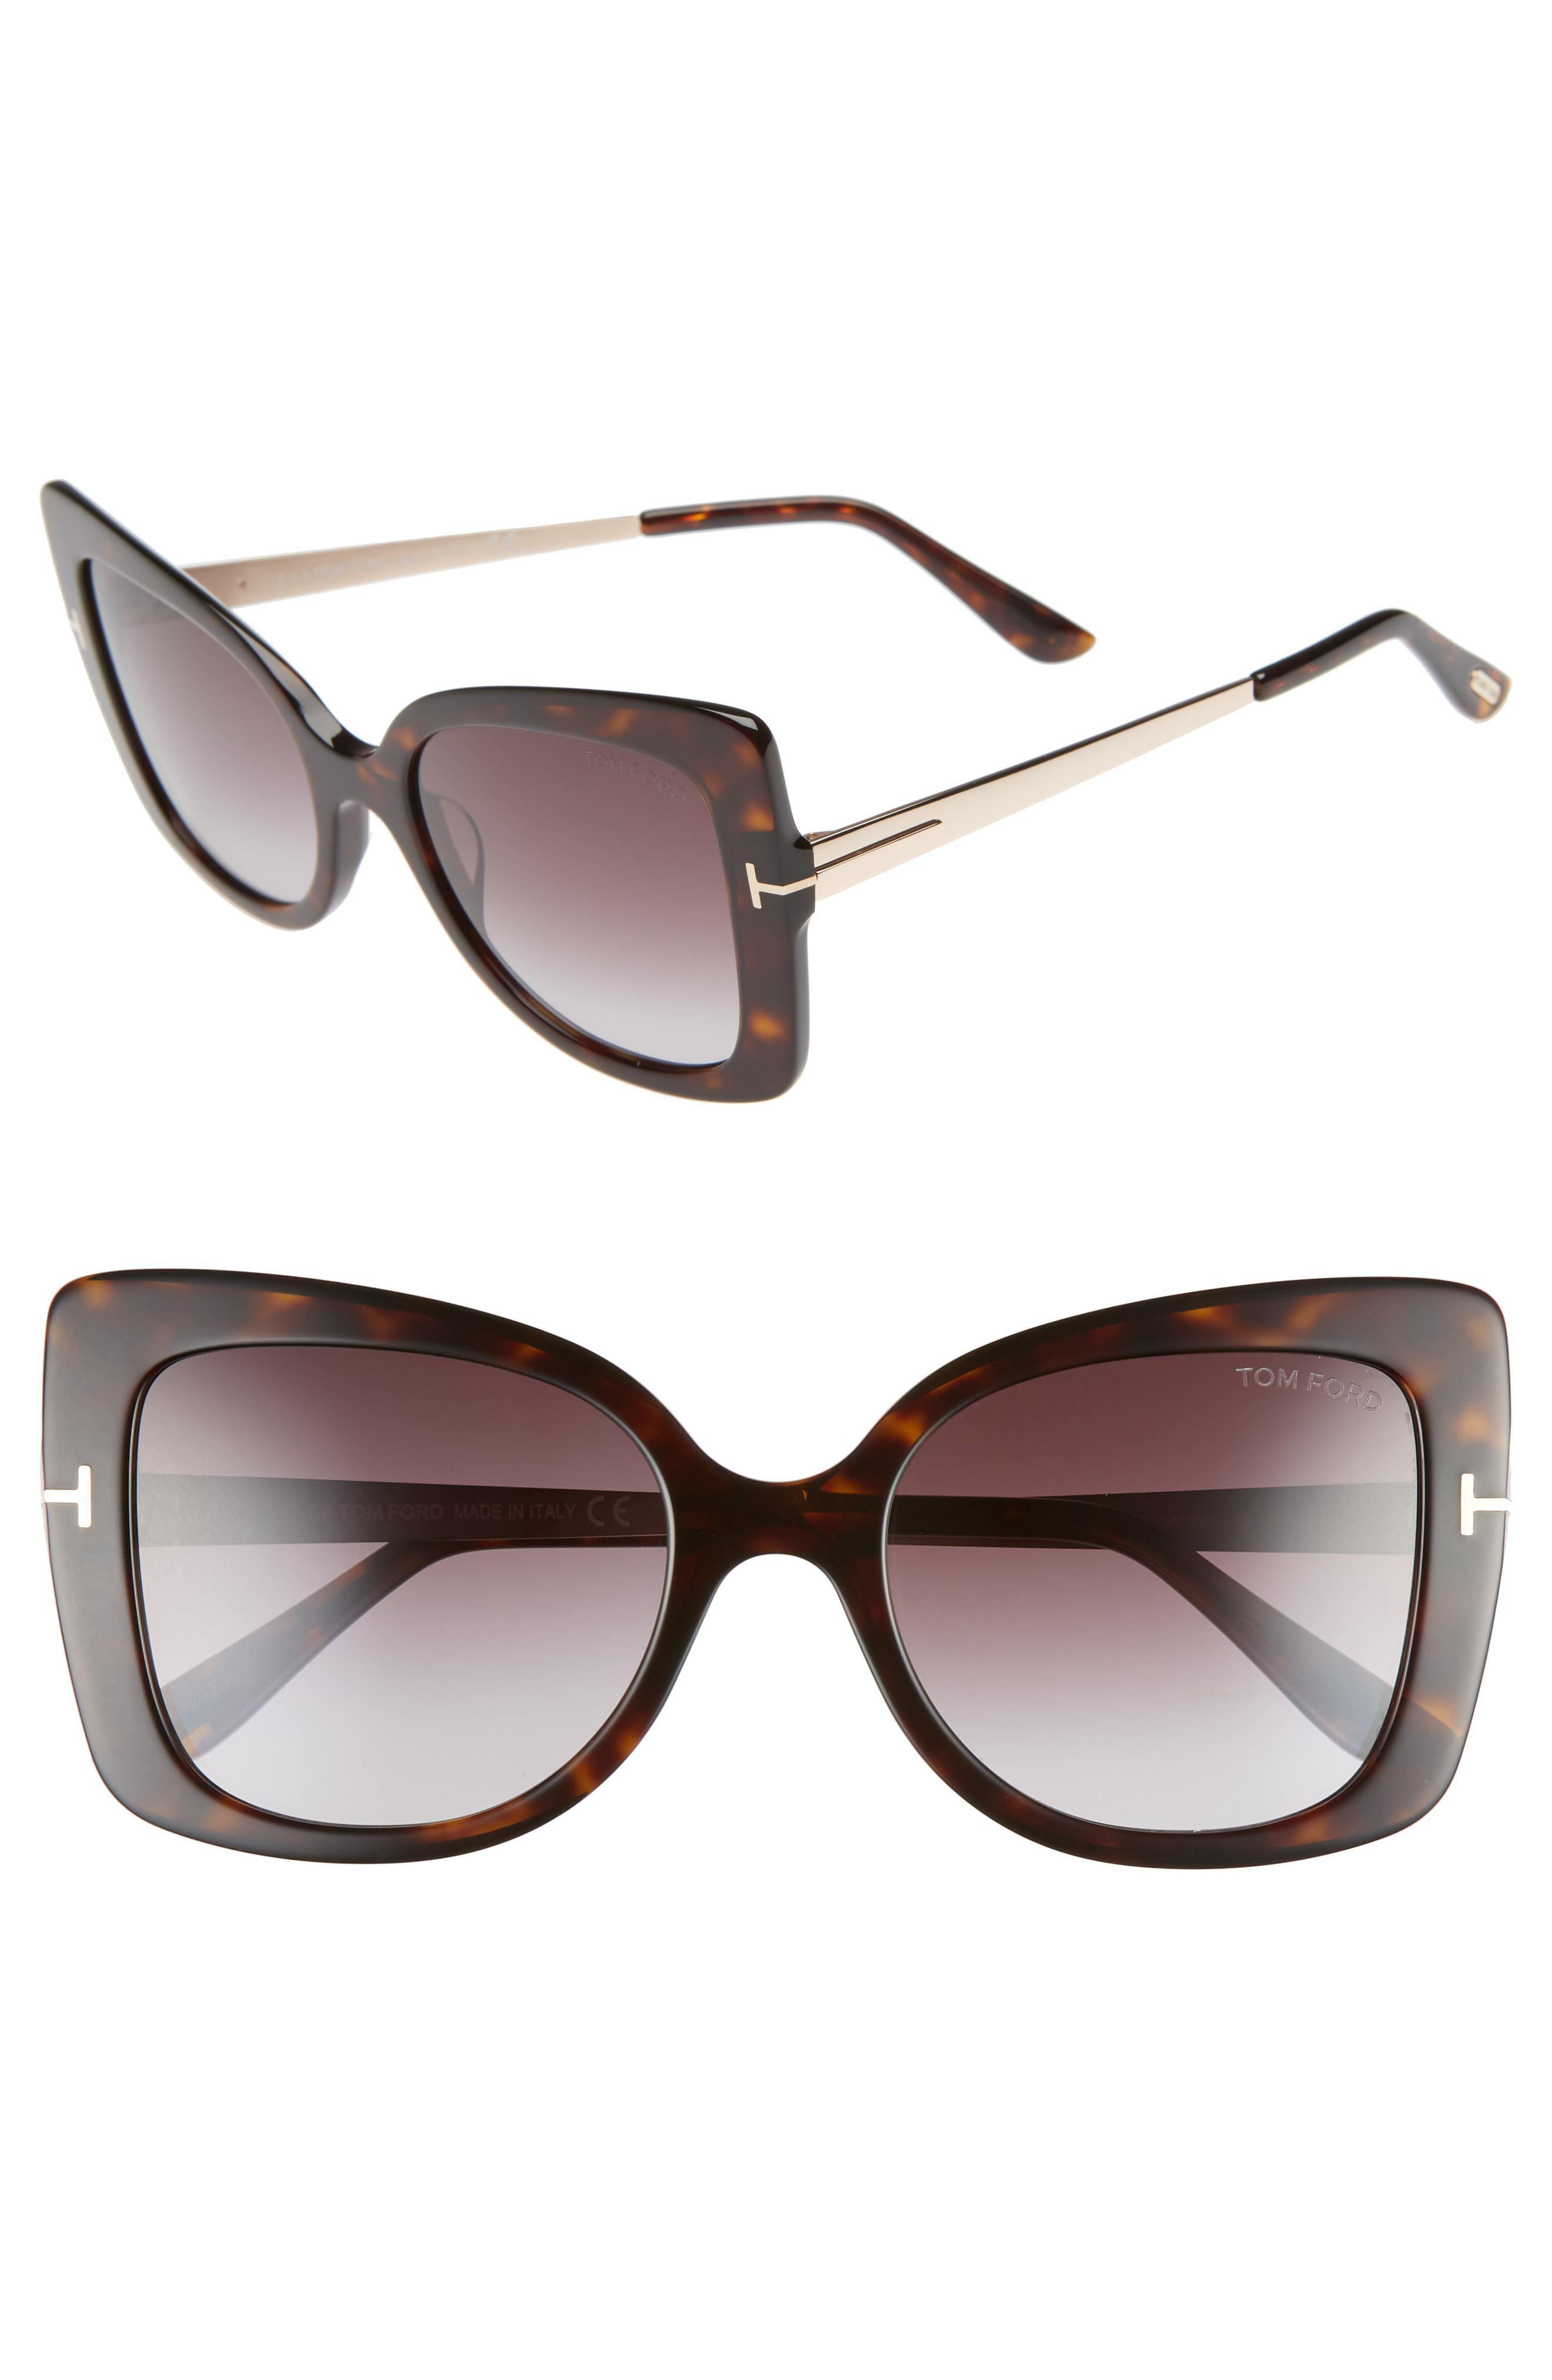 f6e1e44aae Tom Ford - Multicolor Gianna 54mm Sunglasses - Dark Havana  Gradient  Bordeaux - Lyst. View fullscreen